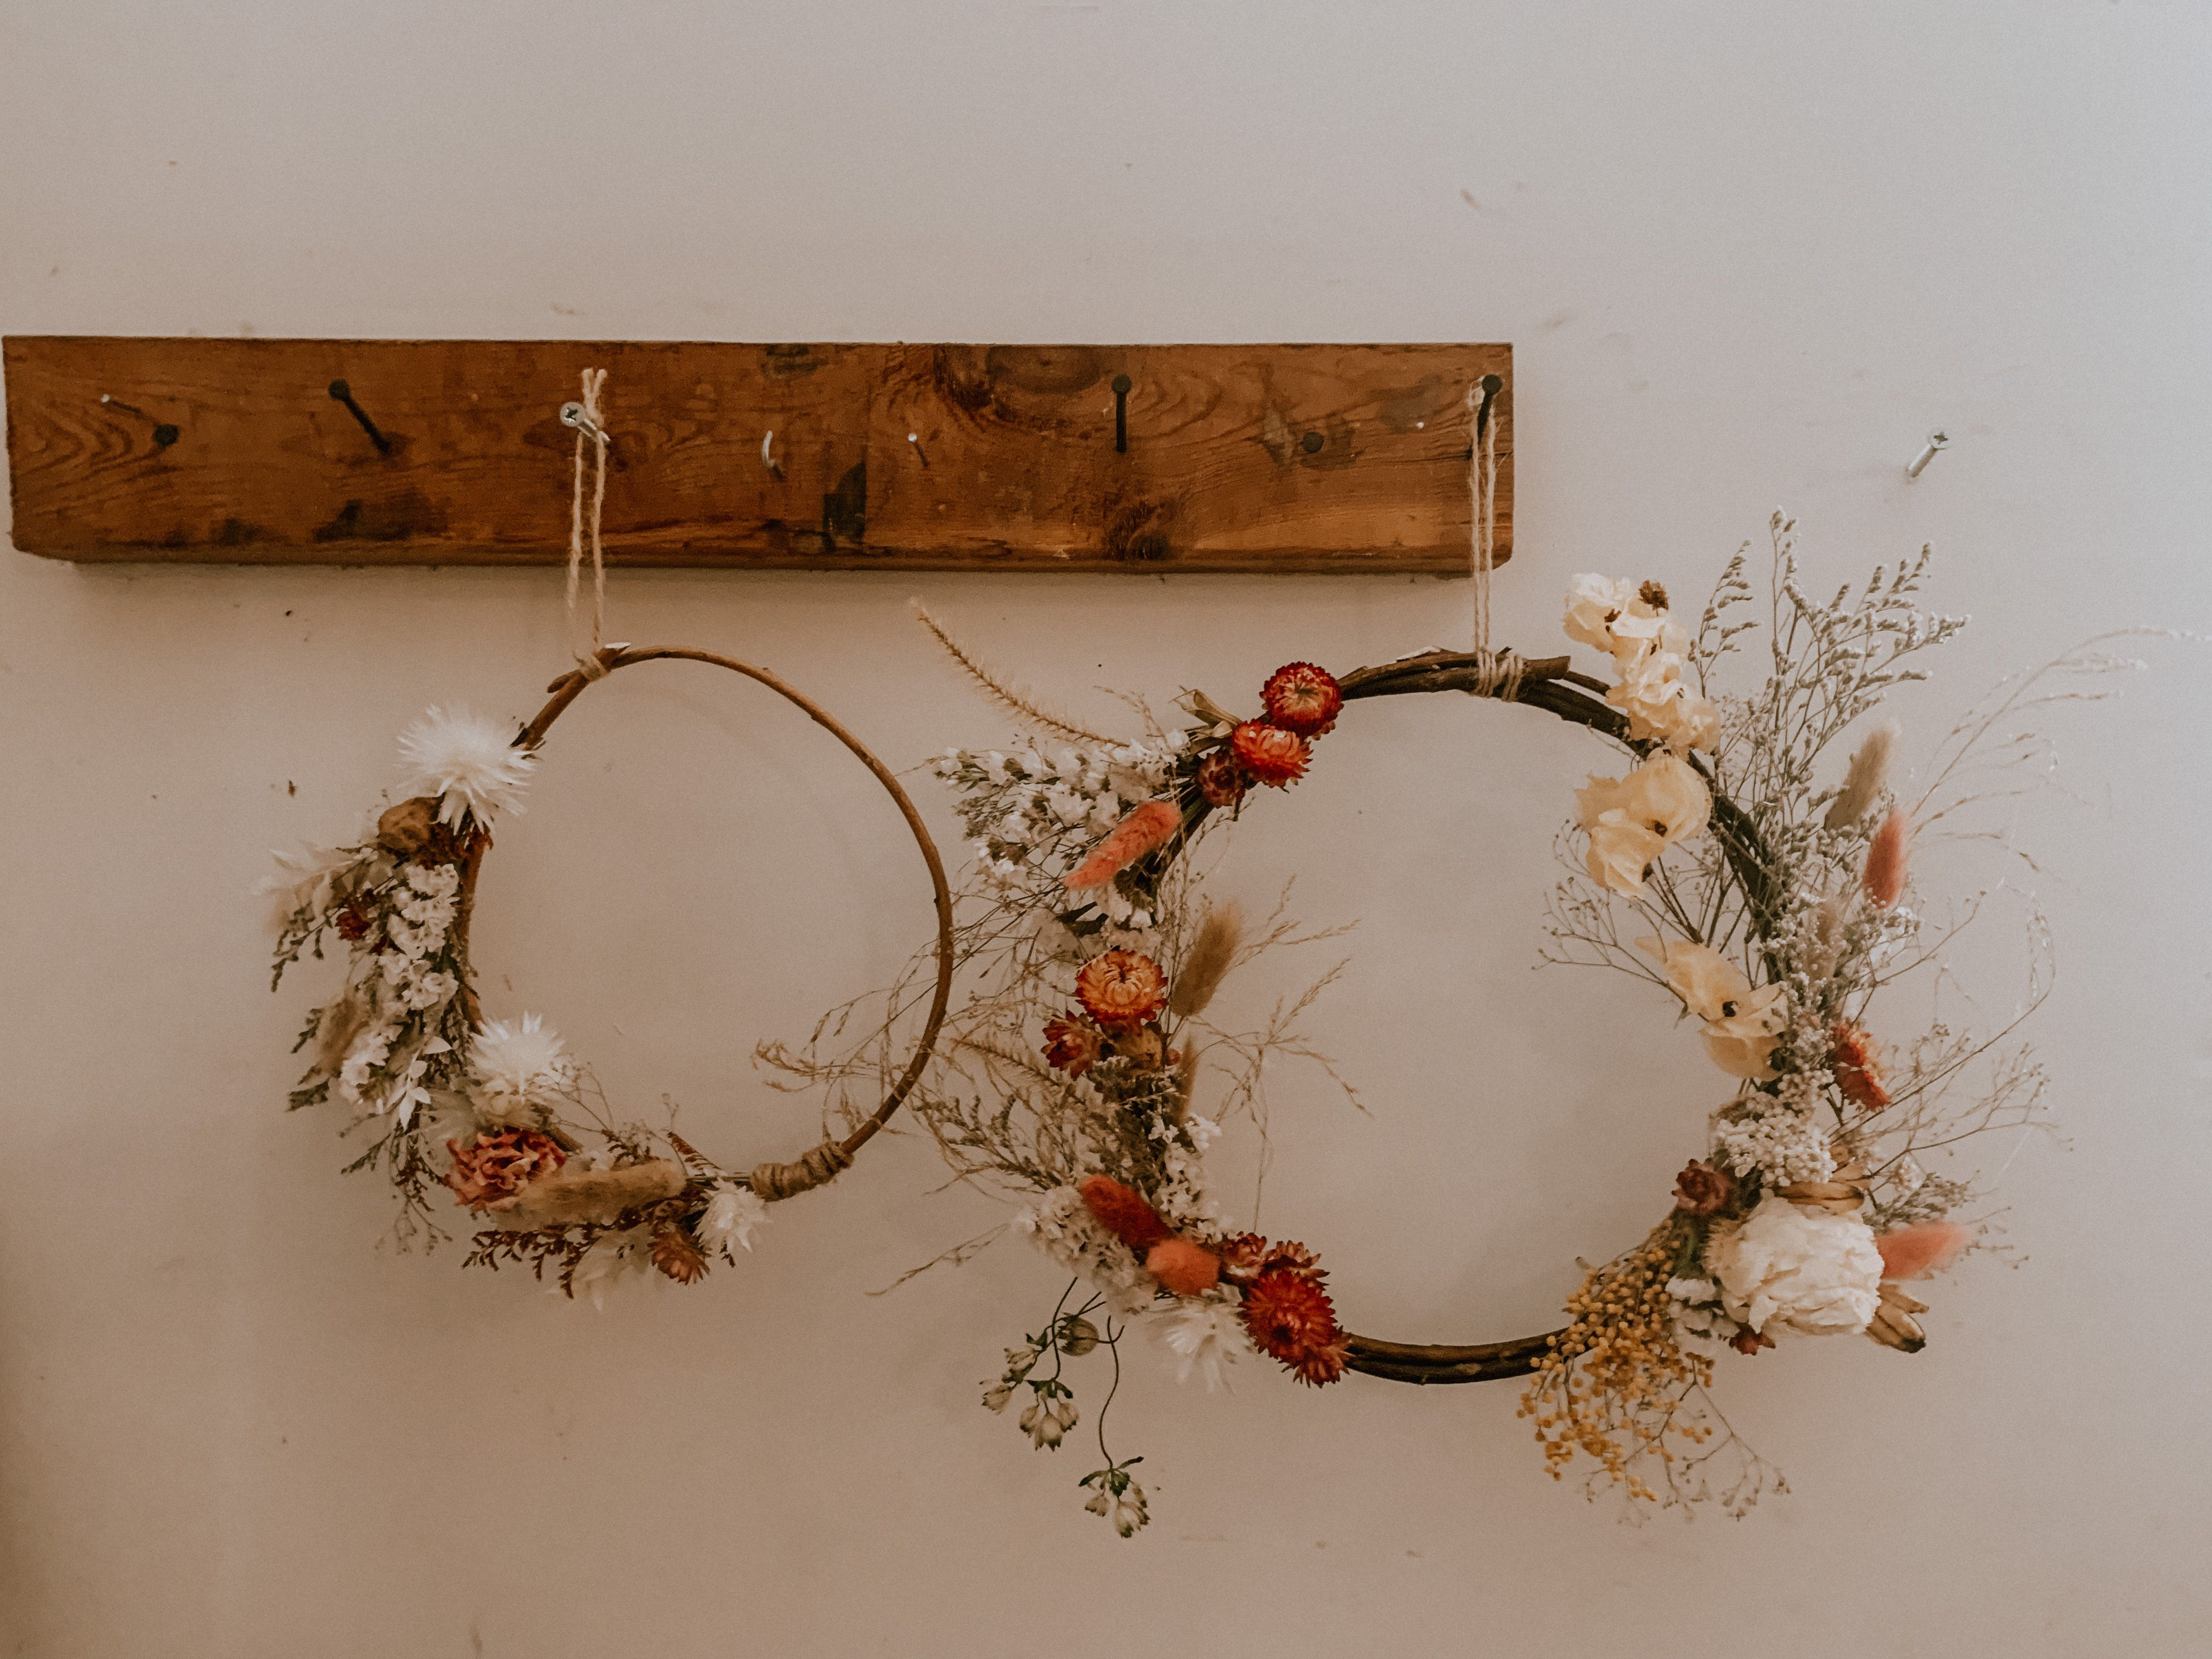 #floralarrangements #flowers #driedflowers #driedflorals